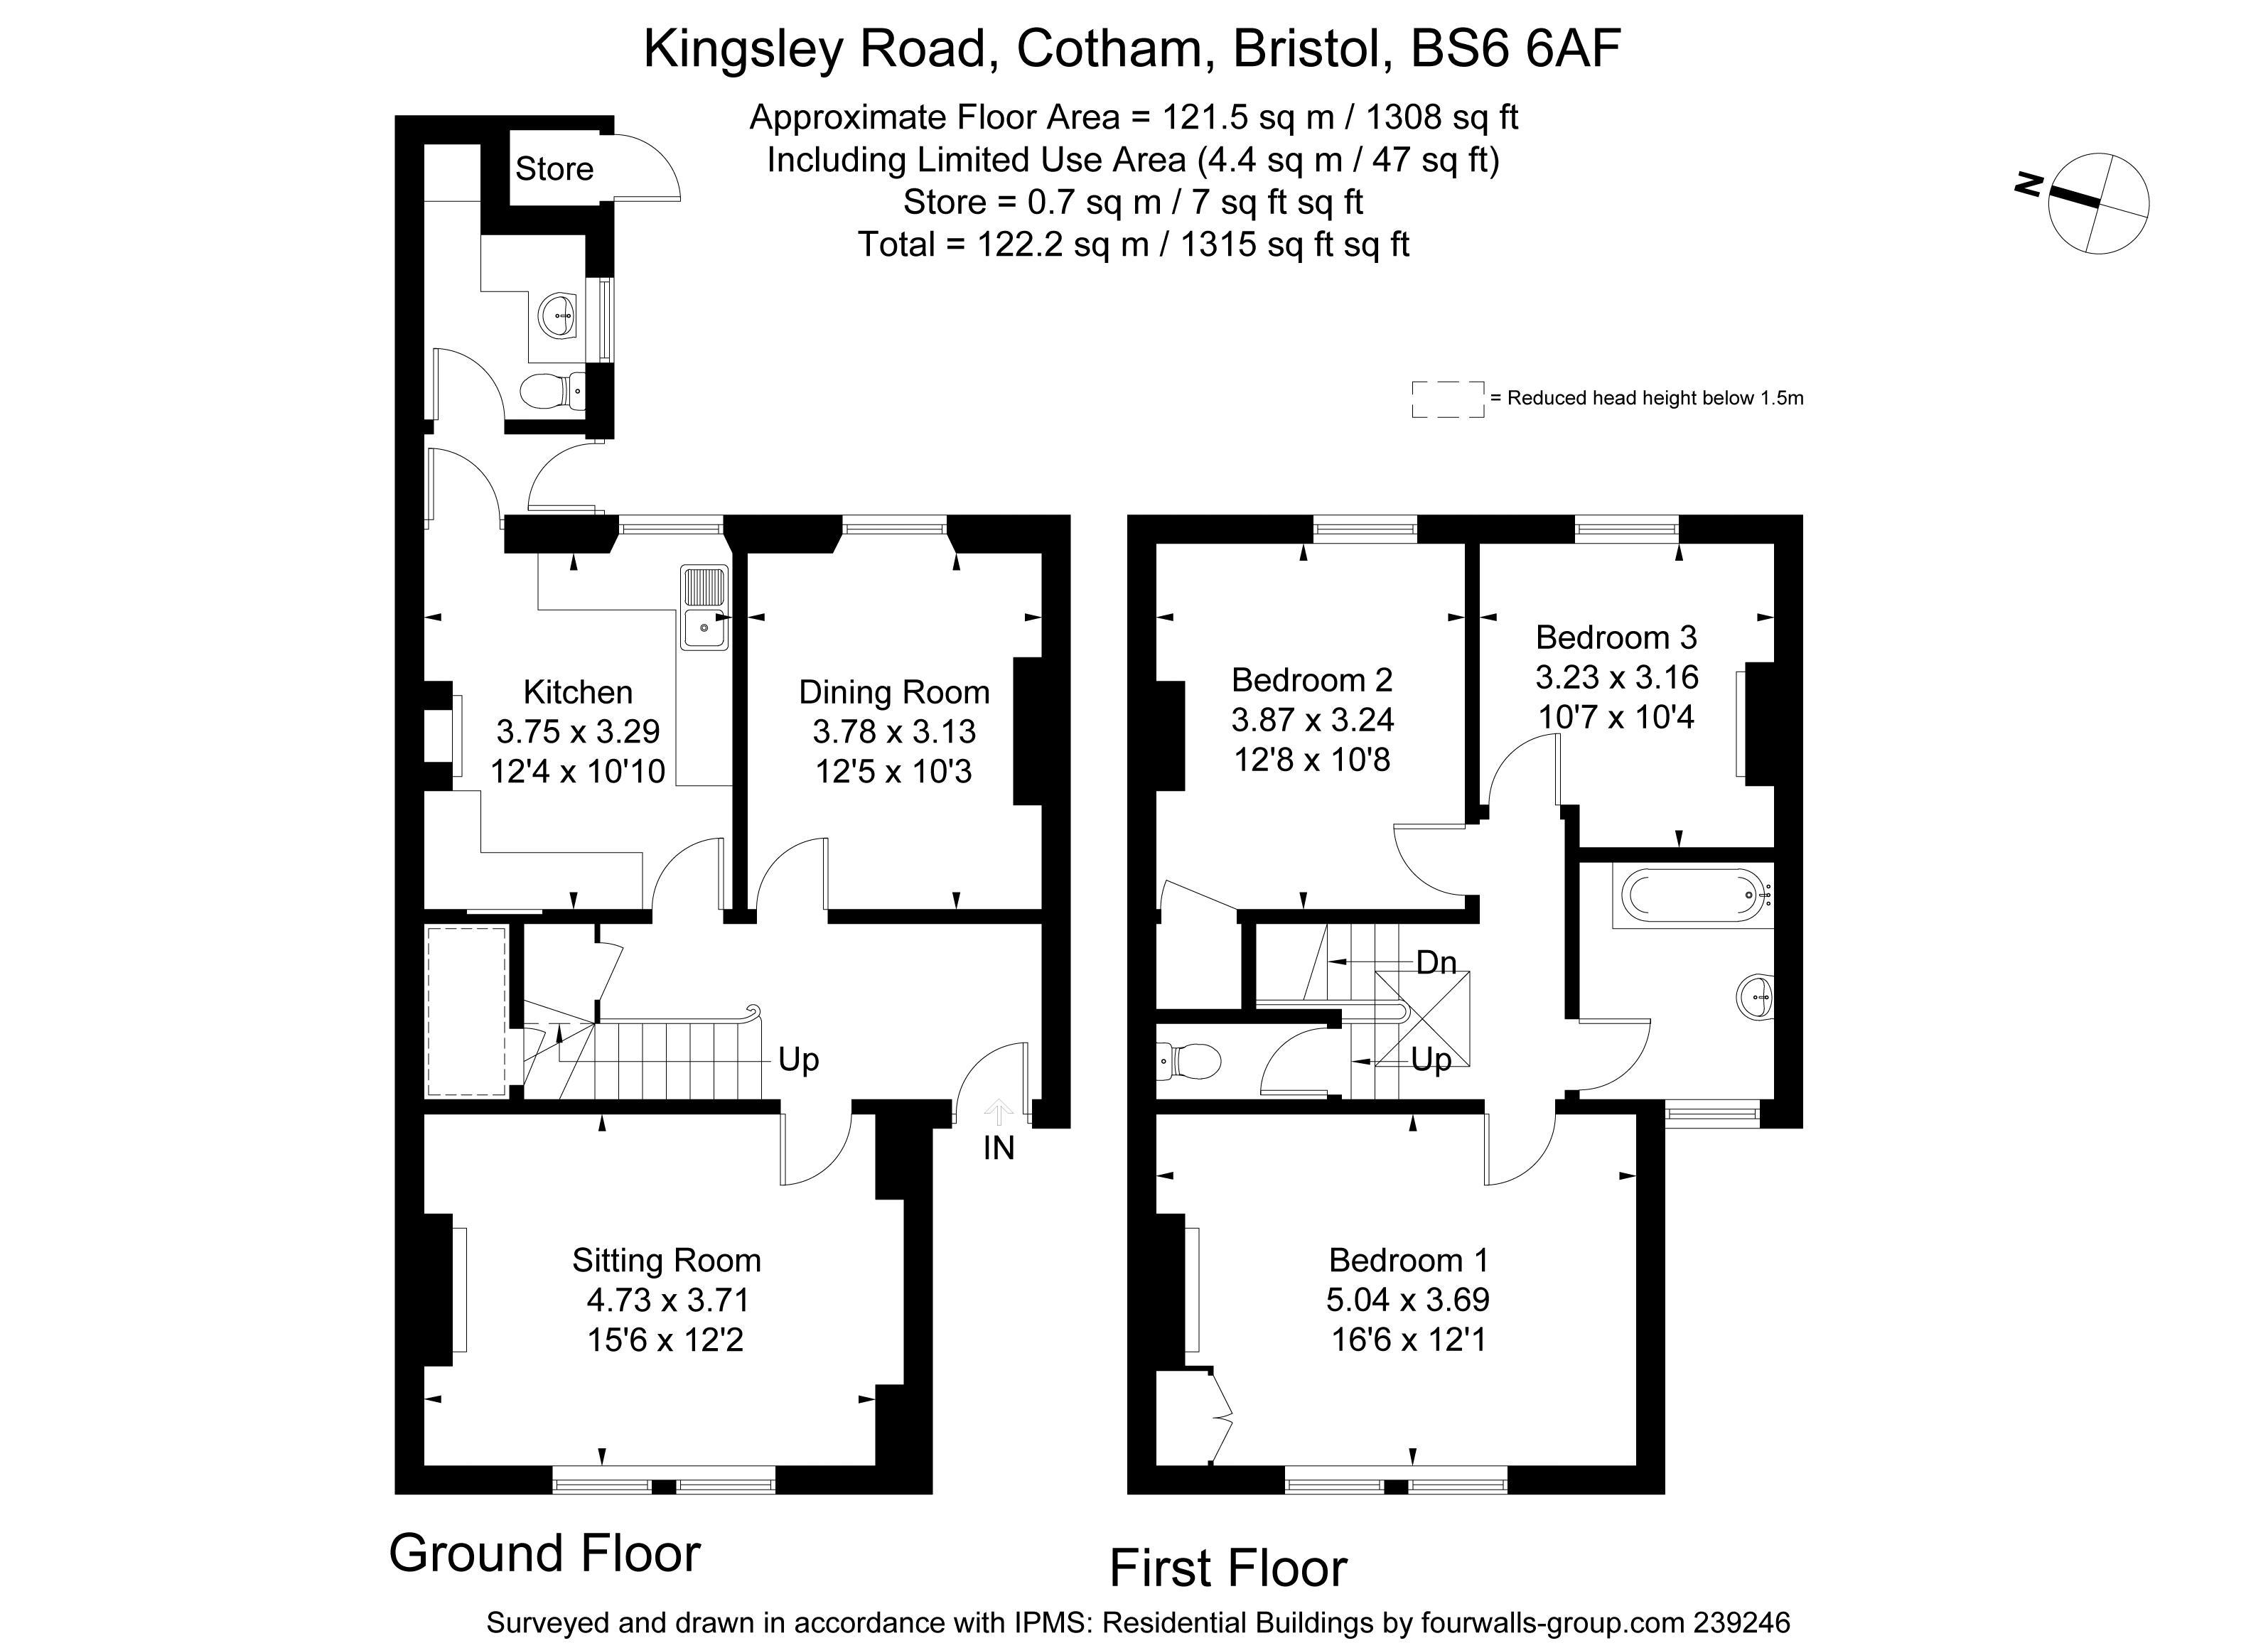 3 Bedroom Property For Sale In Kingsley Road Cotham